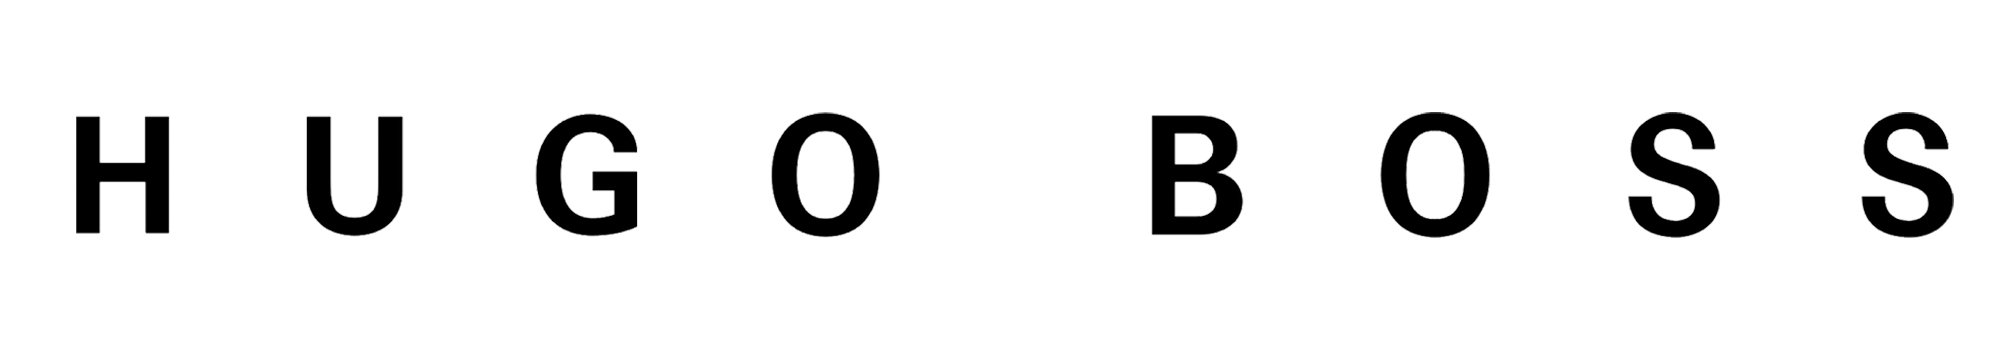 hugo boss logo hugo boss symbol meaning history and